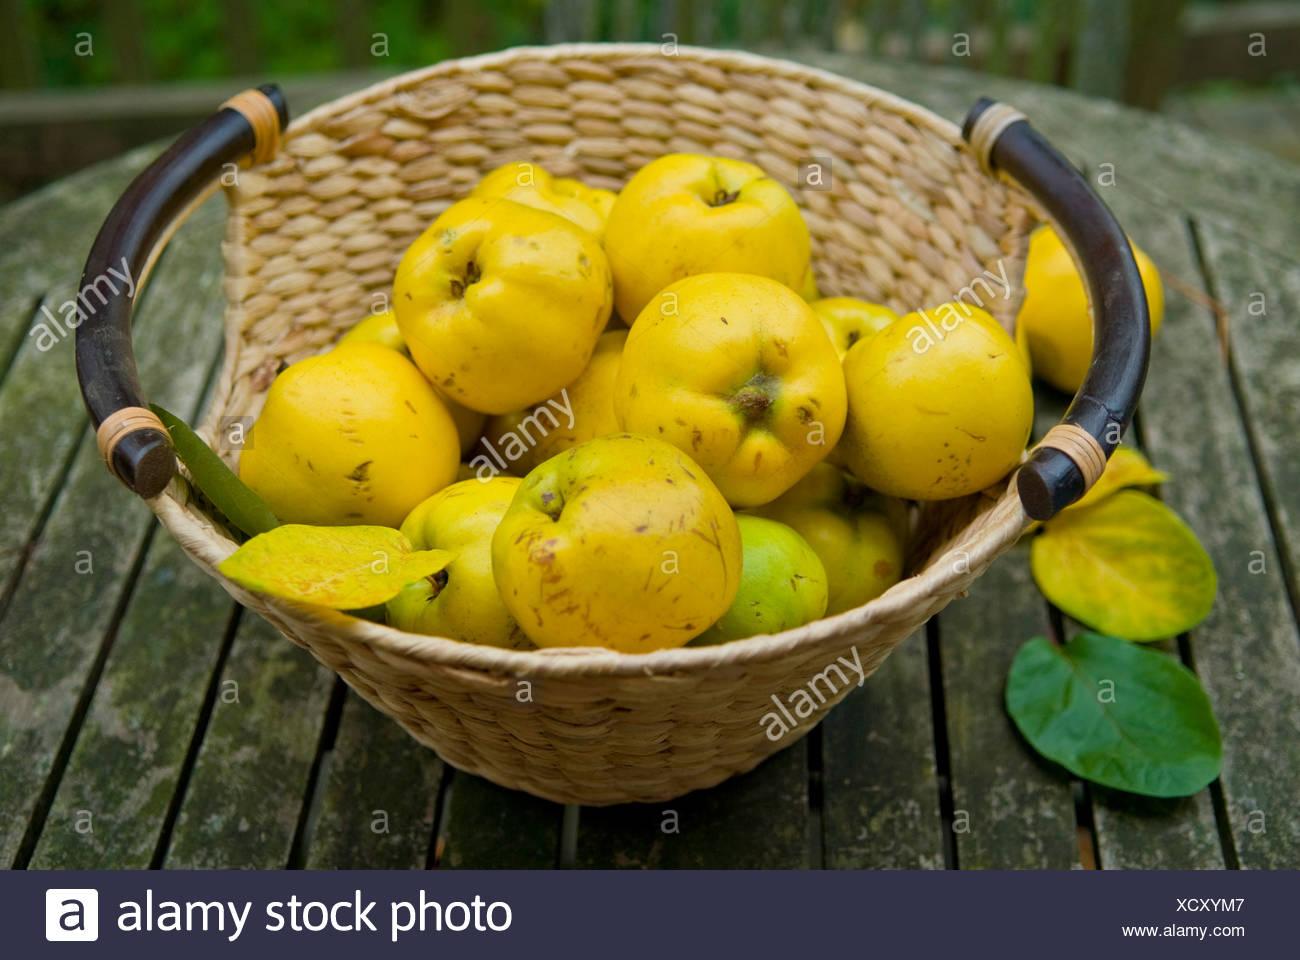 Basket with freshly harvested quinces (Cydonia oblonga) Stock Photo